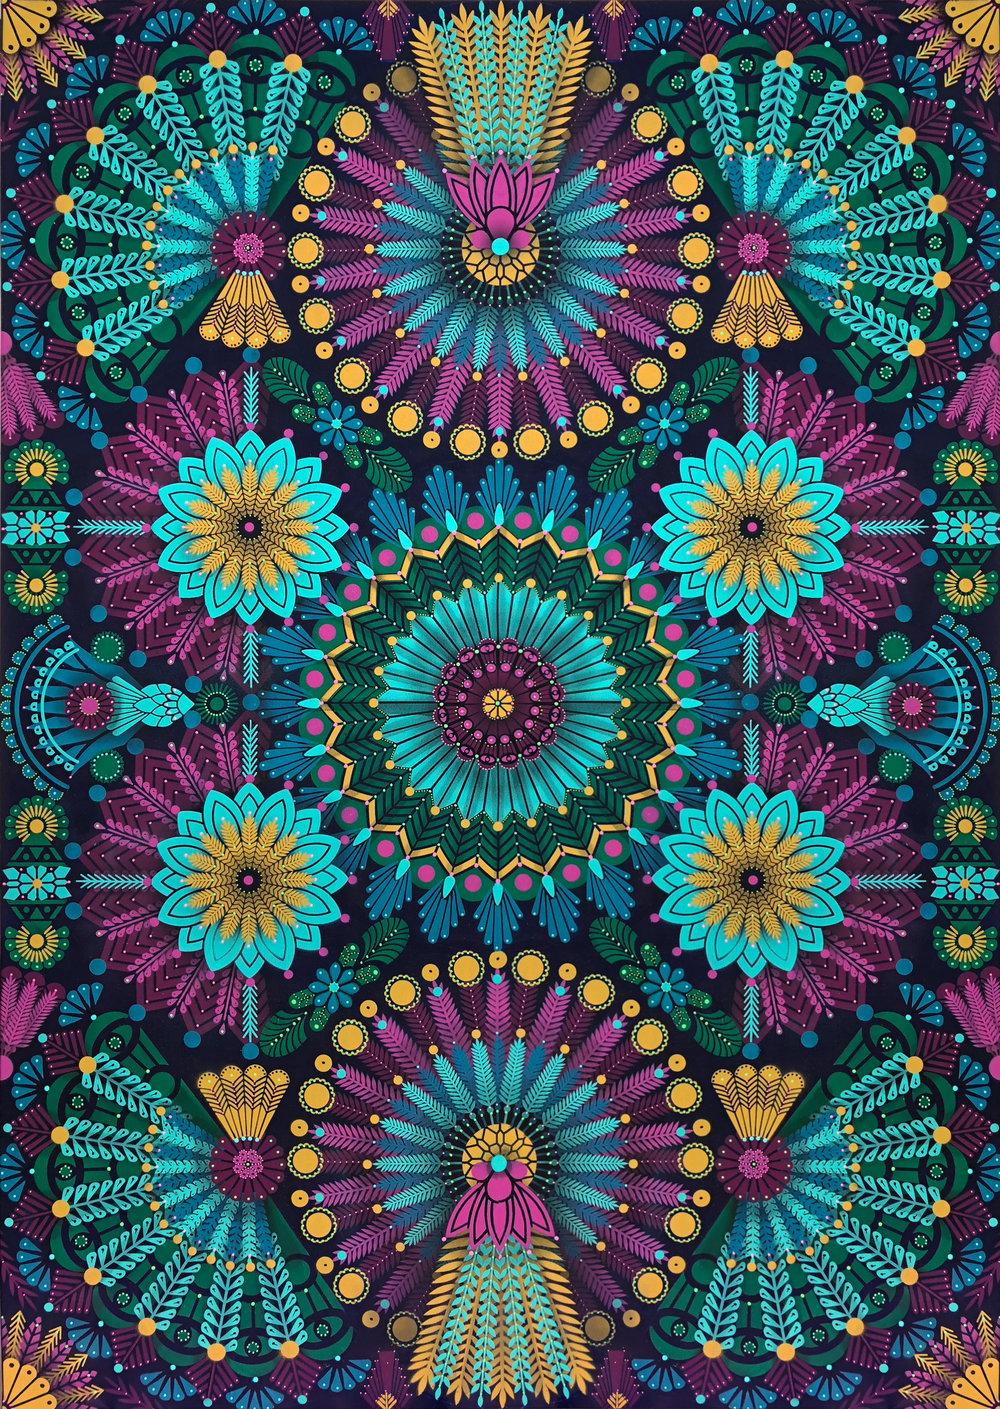 Kaleidoscopic Nature #2  - Acrylic on canvas, 162 x 114 cm   2018